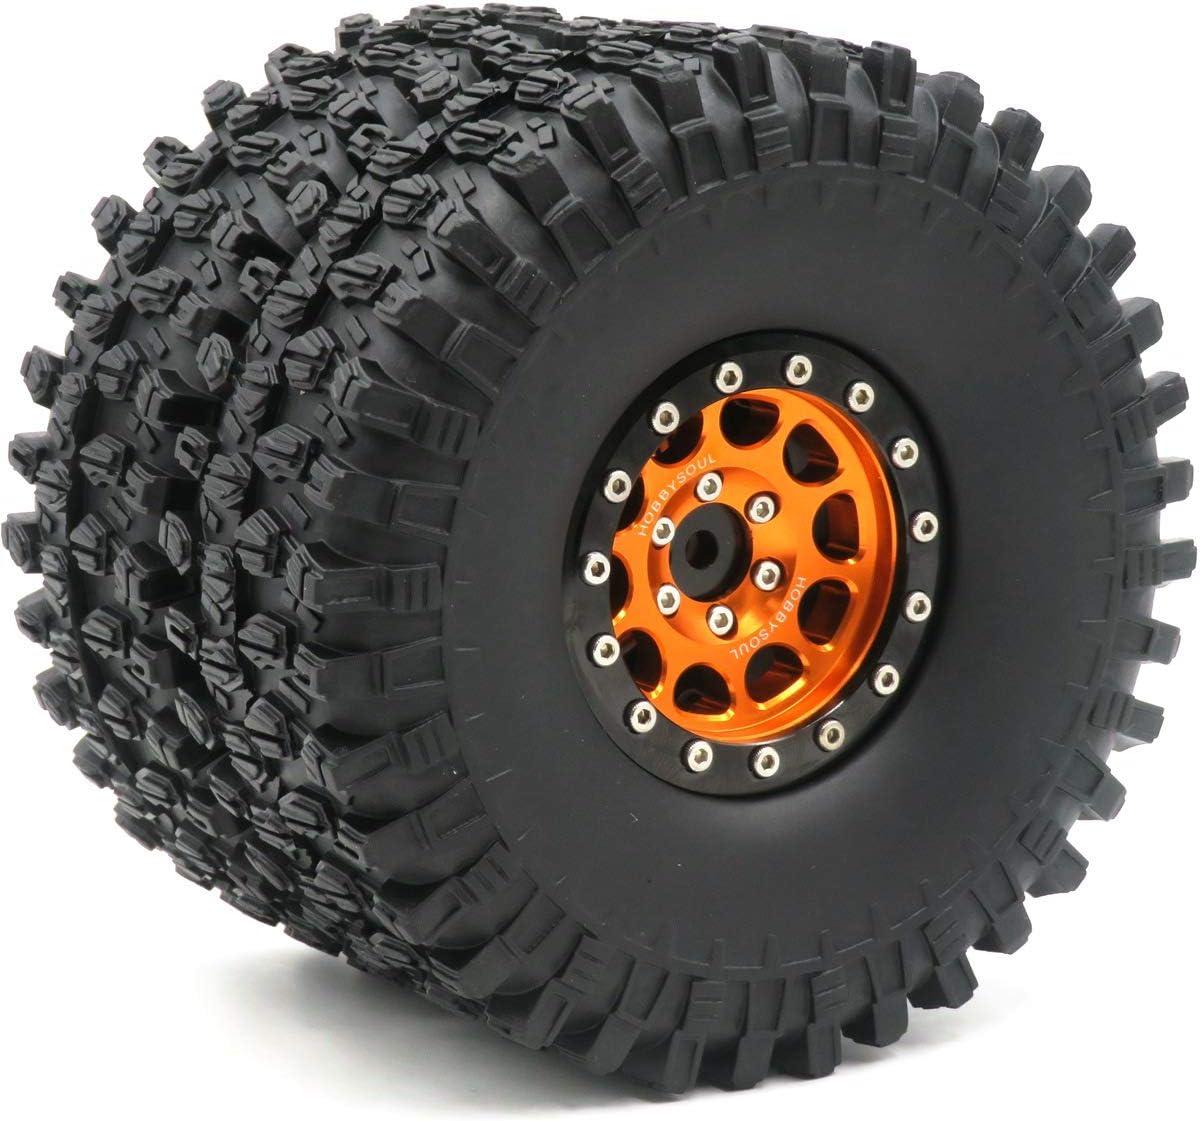 OD 120mm /& Aluminum 1.9 Beadlock Wheel Rim Hex 12mm Black Orange 5pcs RC 1.9 Super Swamper Crawler Tires Tyre Height